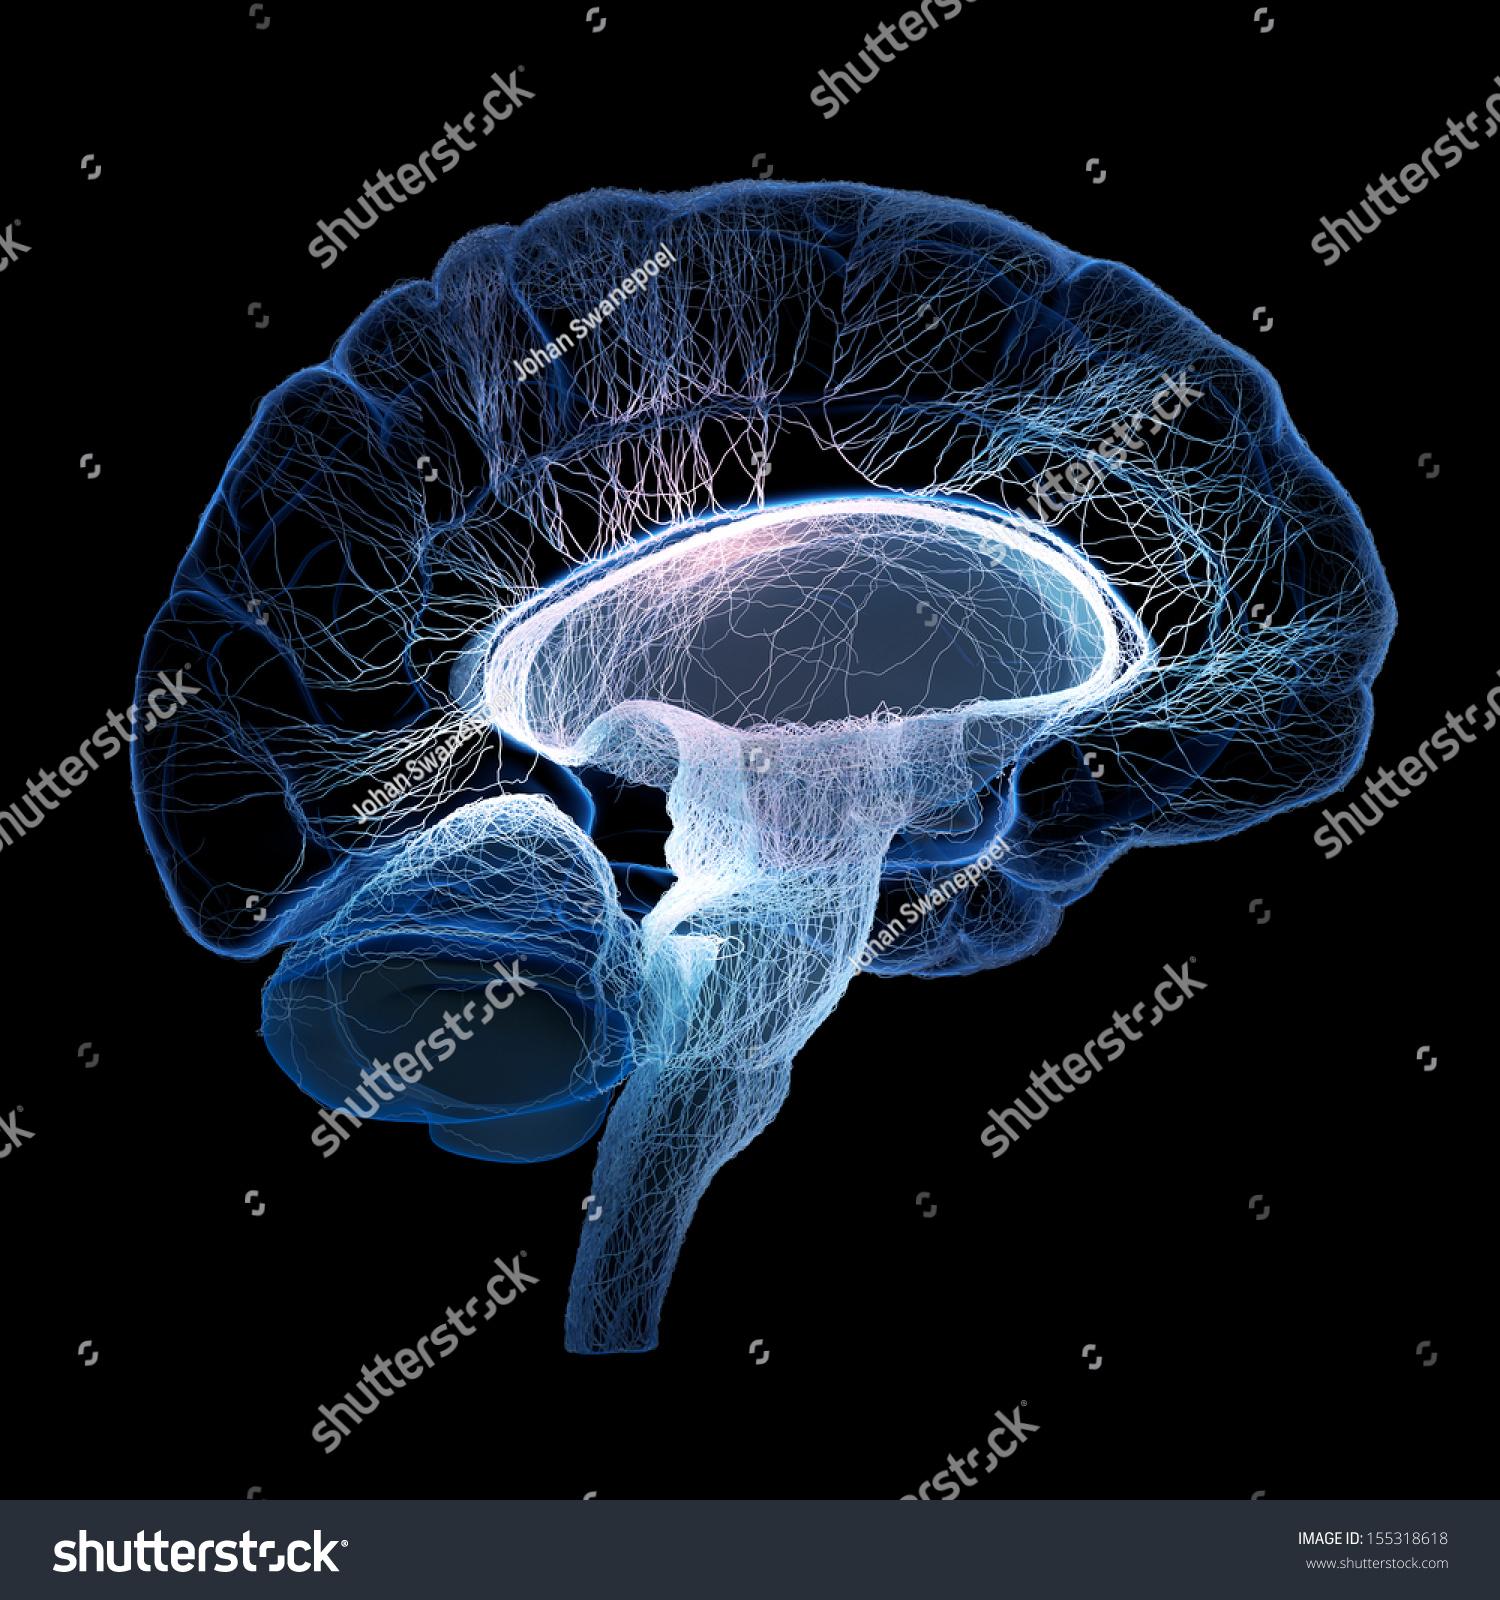 Neocortex: Online Image & Photo Editor